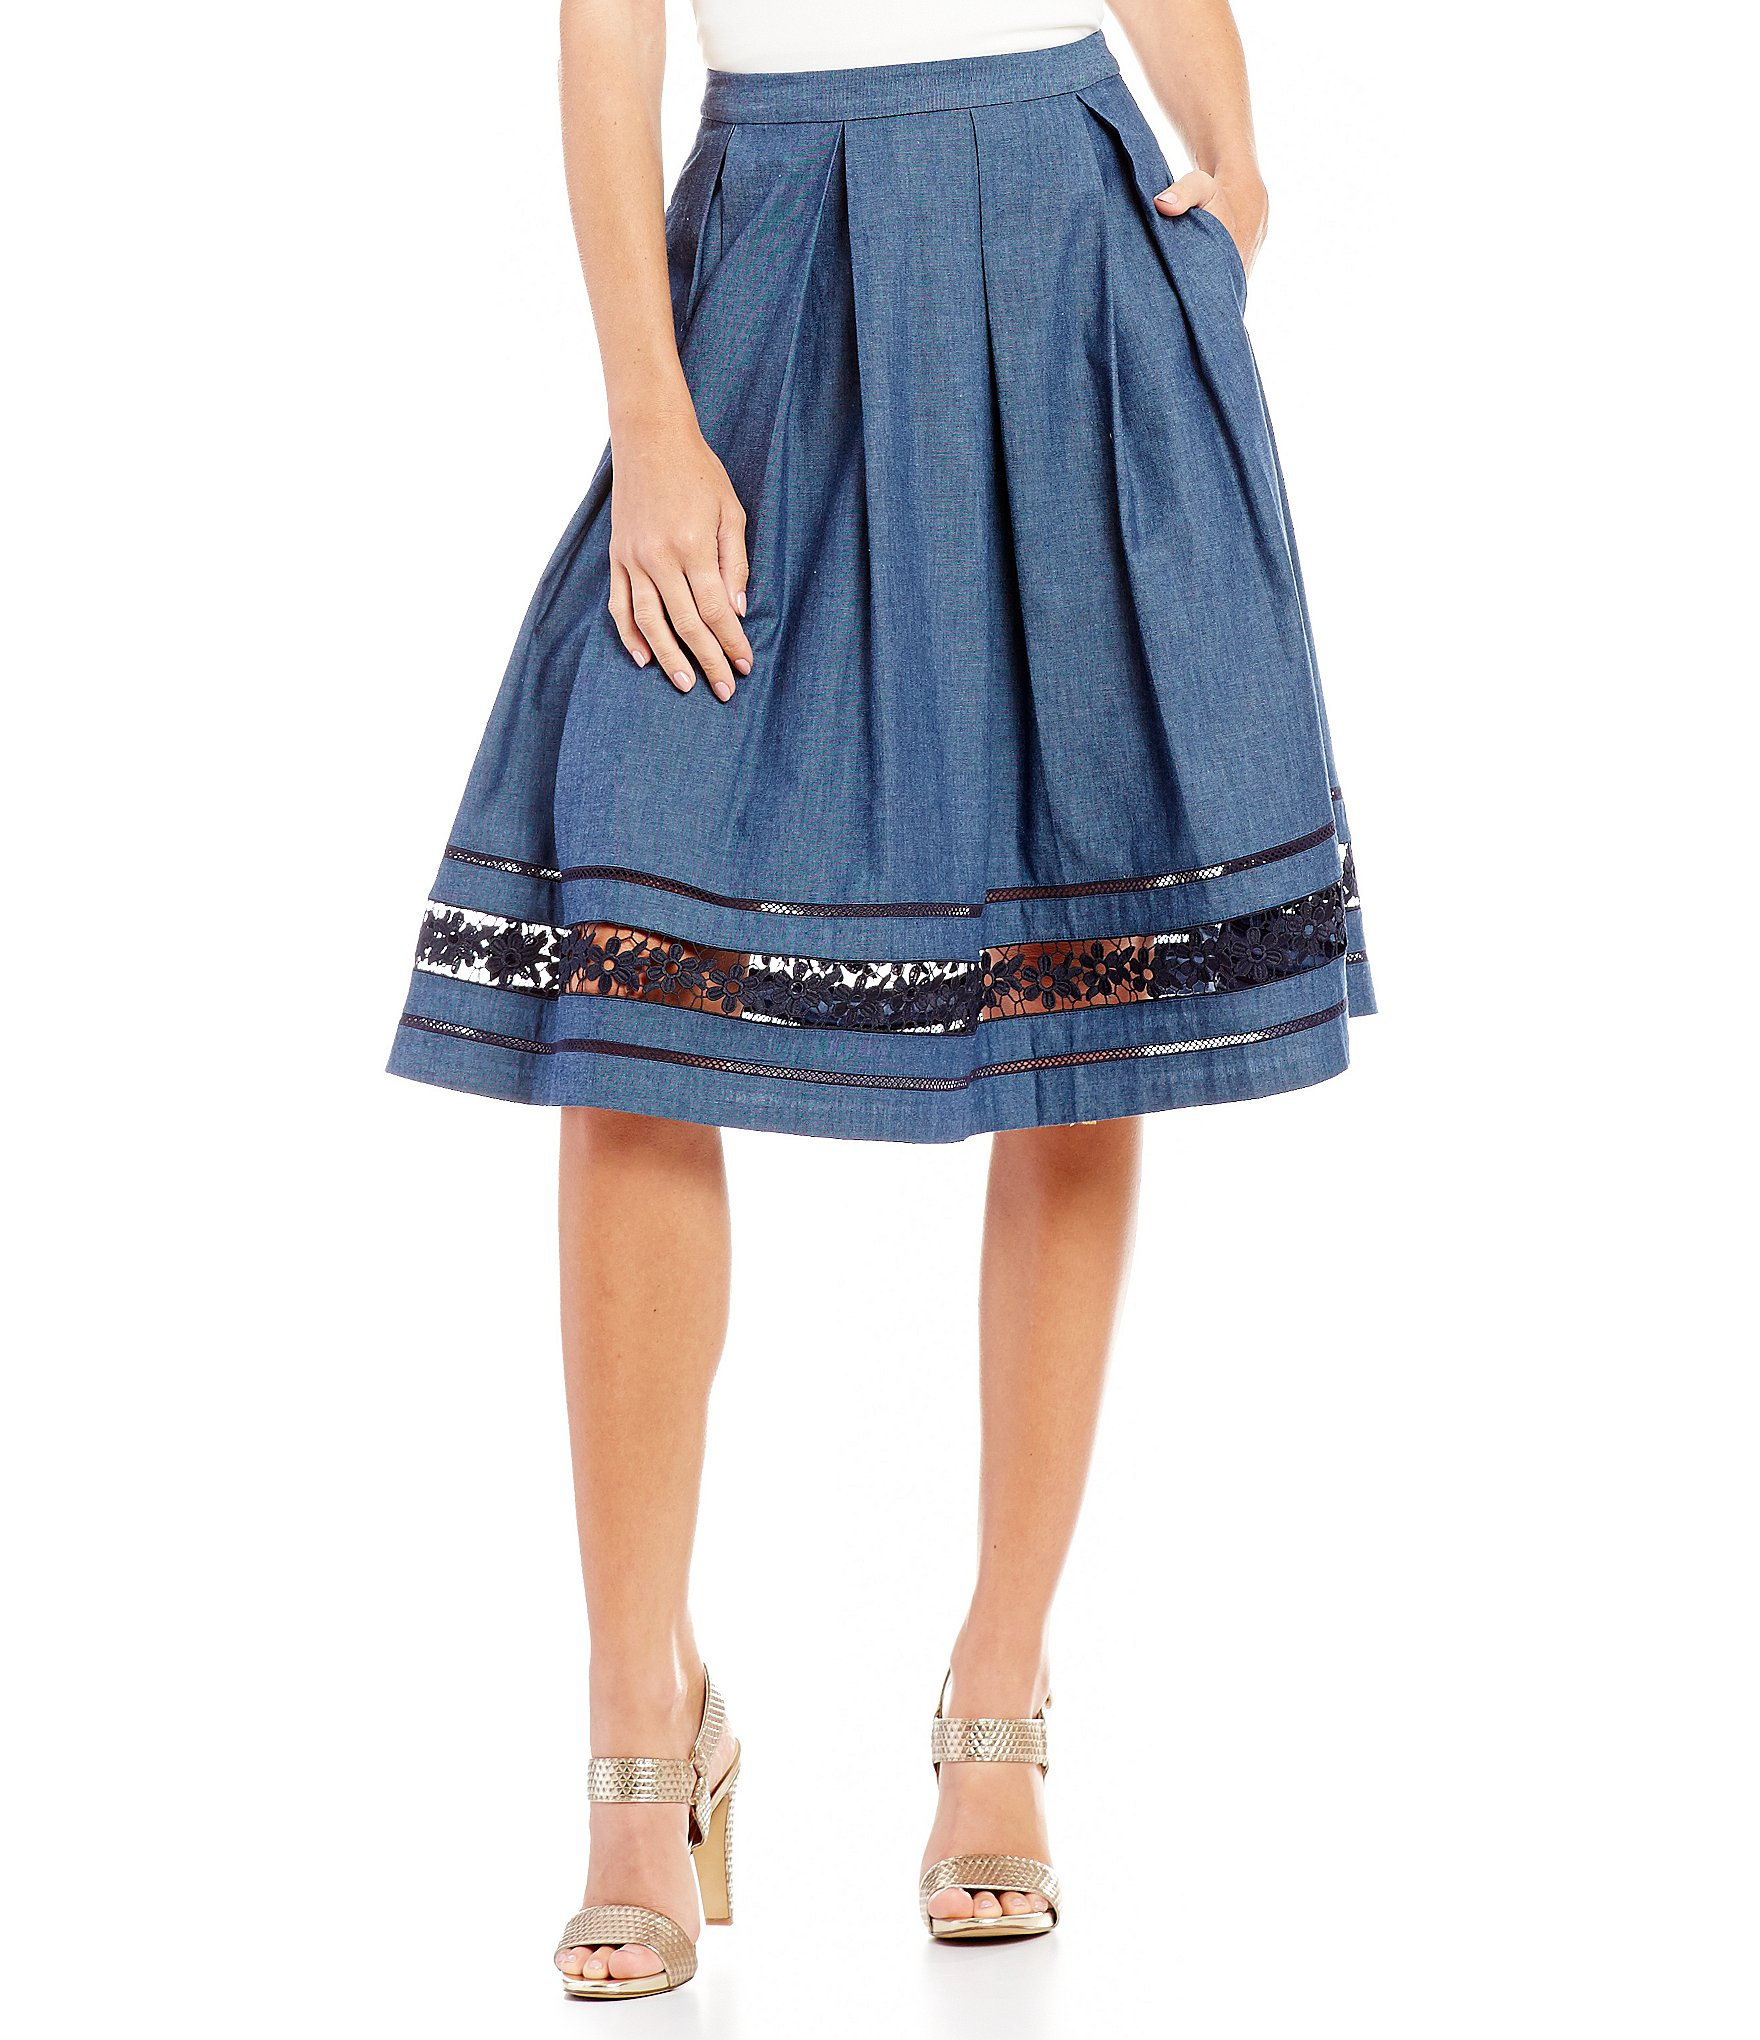 KARL LAGERFELD PARIS Embroidered Denim Skirt  Dillards